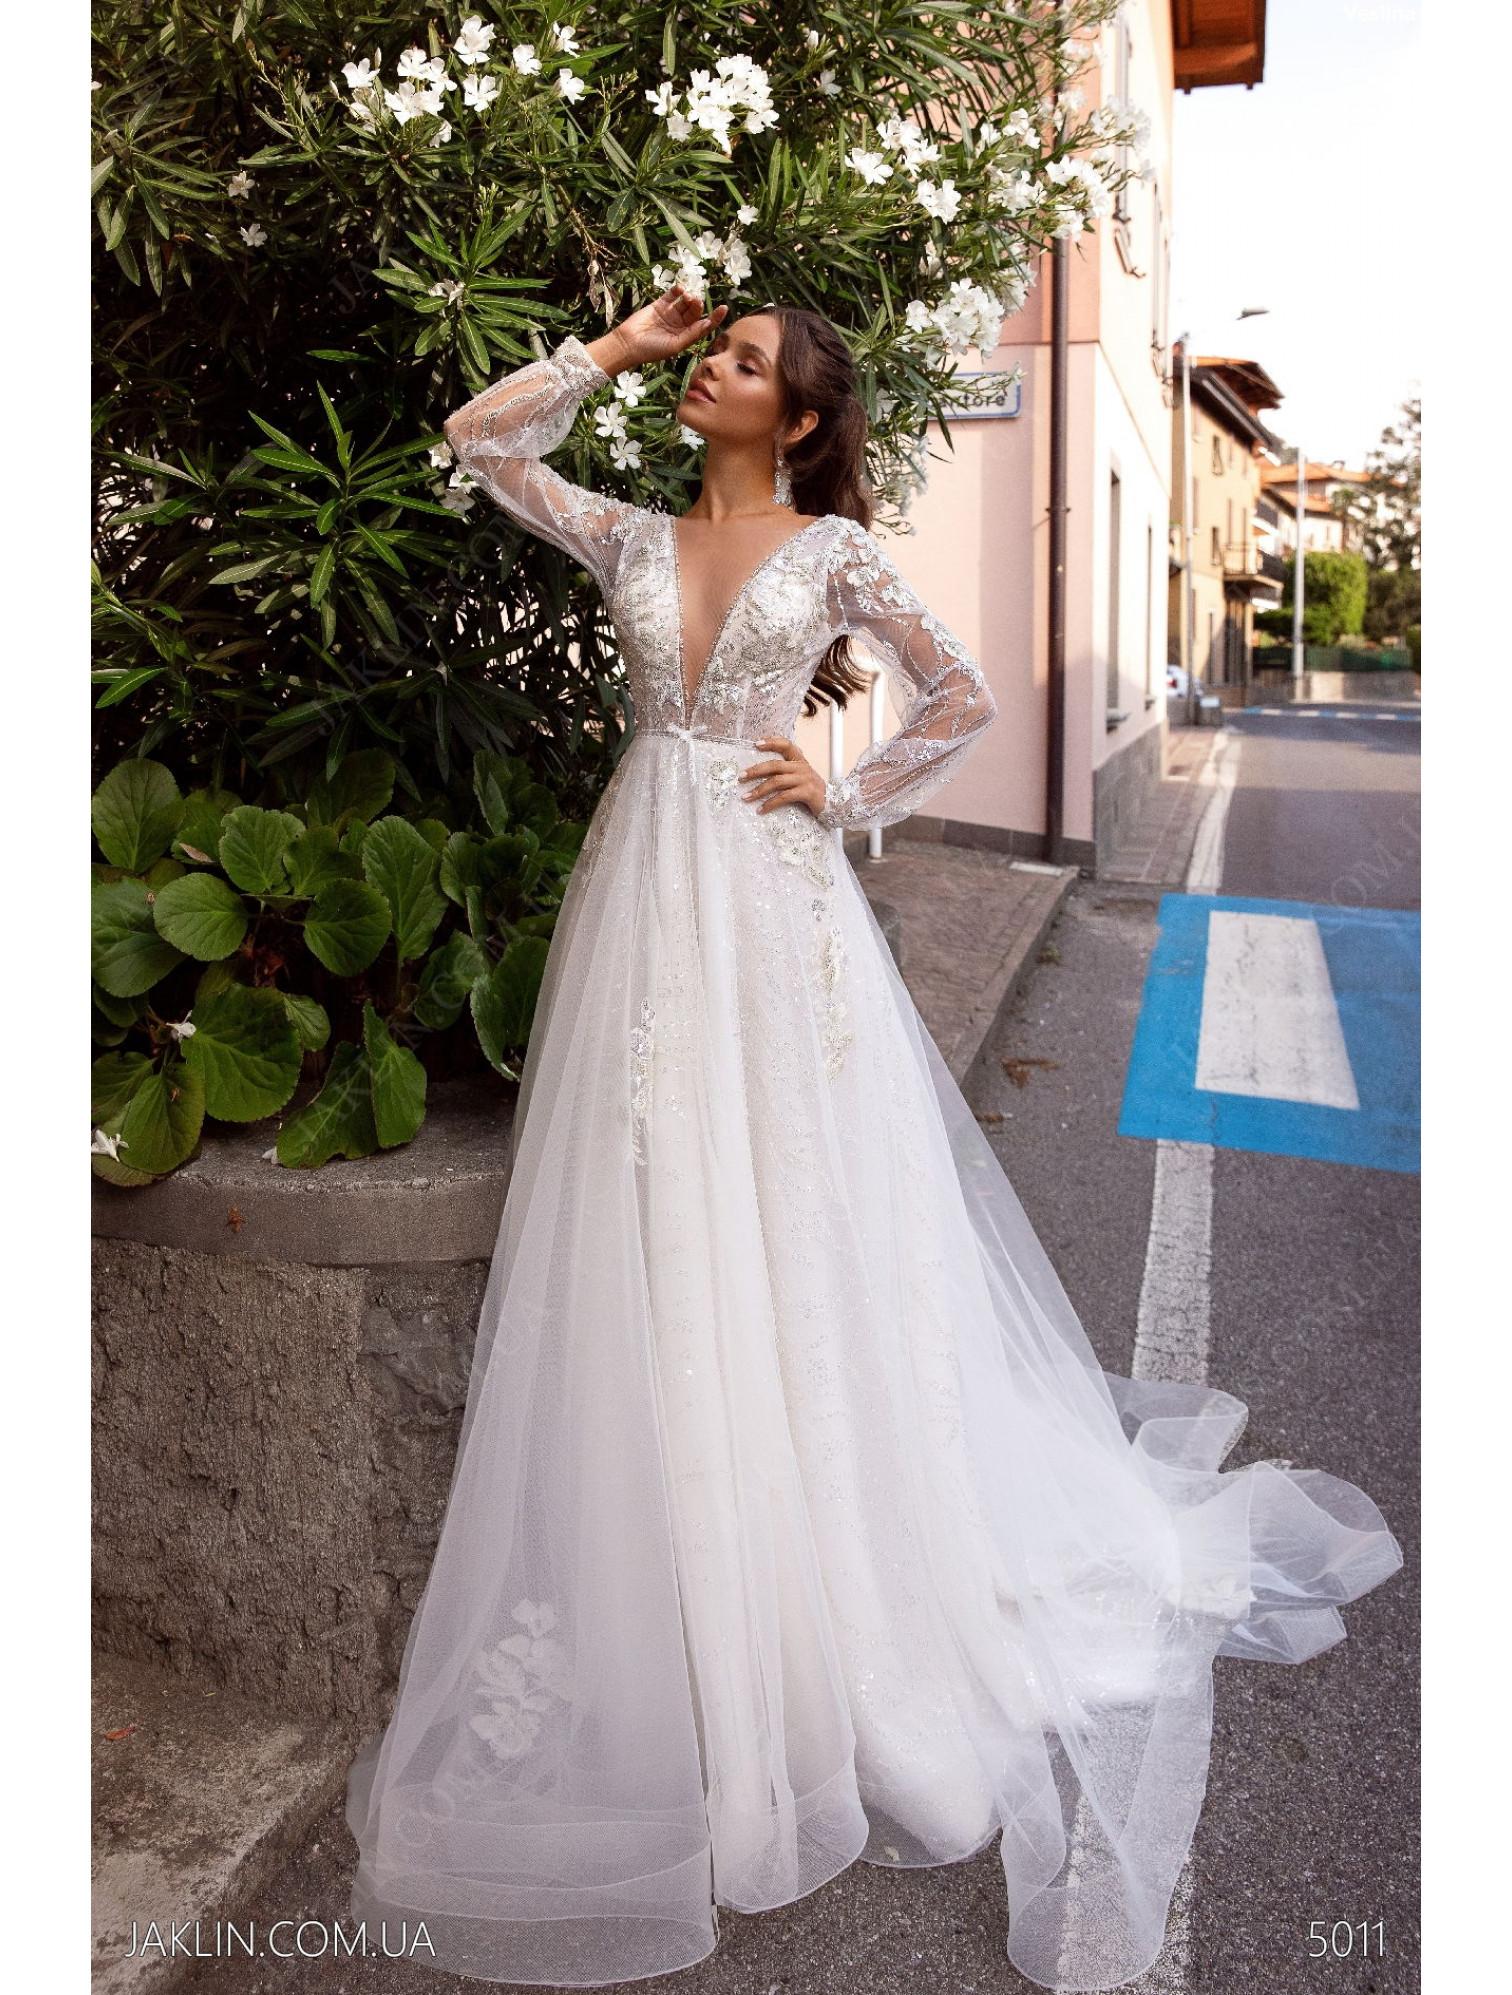 Wedding dress 5011